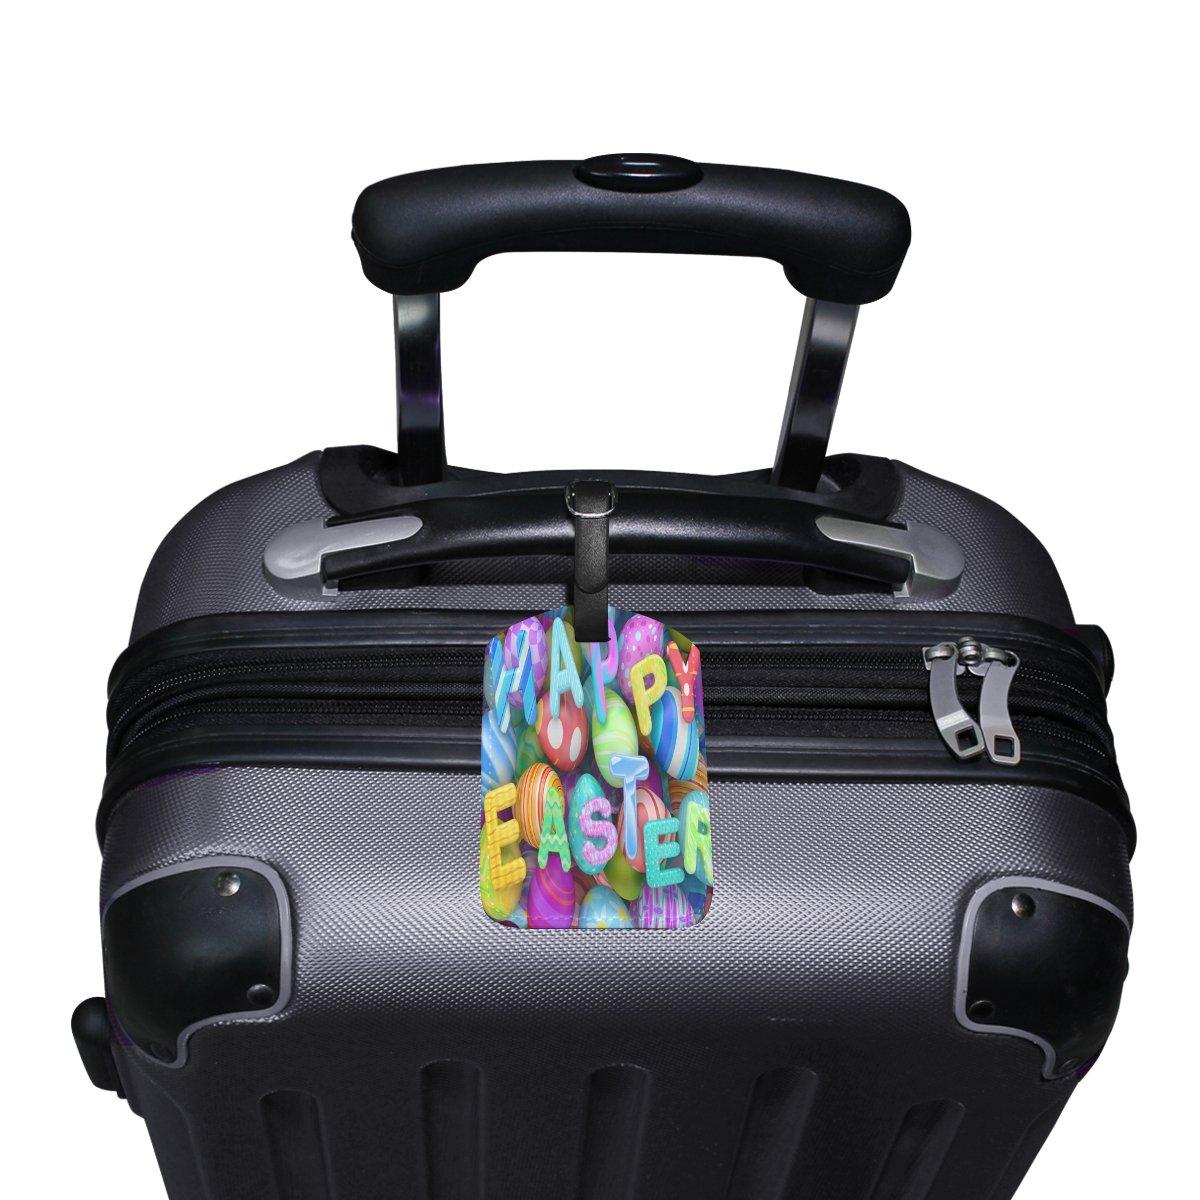 1Pcs Saobao Travel Luggage Tag Holidays Easter Eggs Design English PU Leather Baggage Suitcase Travel ID Bag Tag